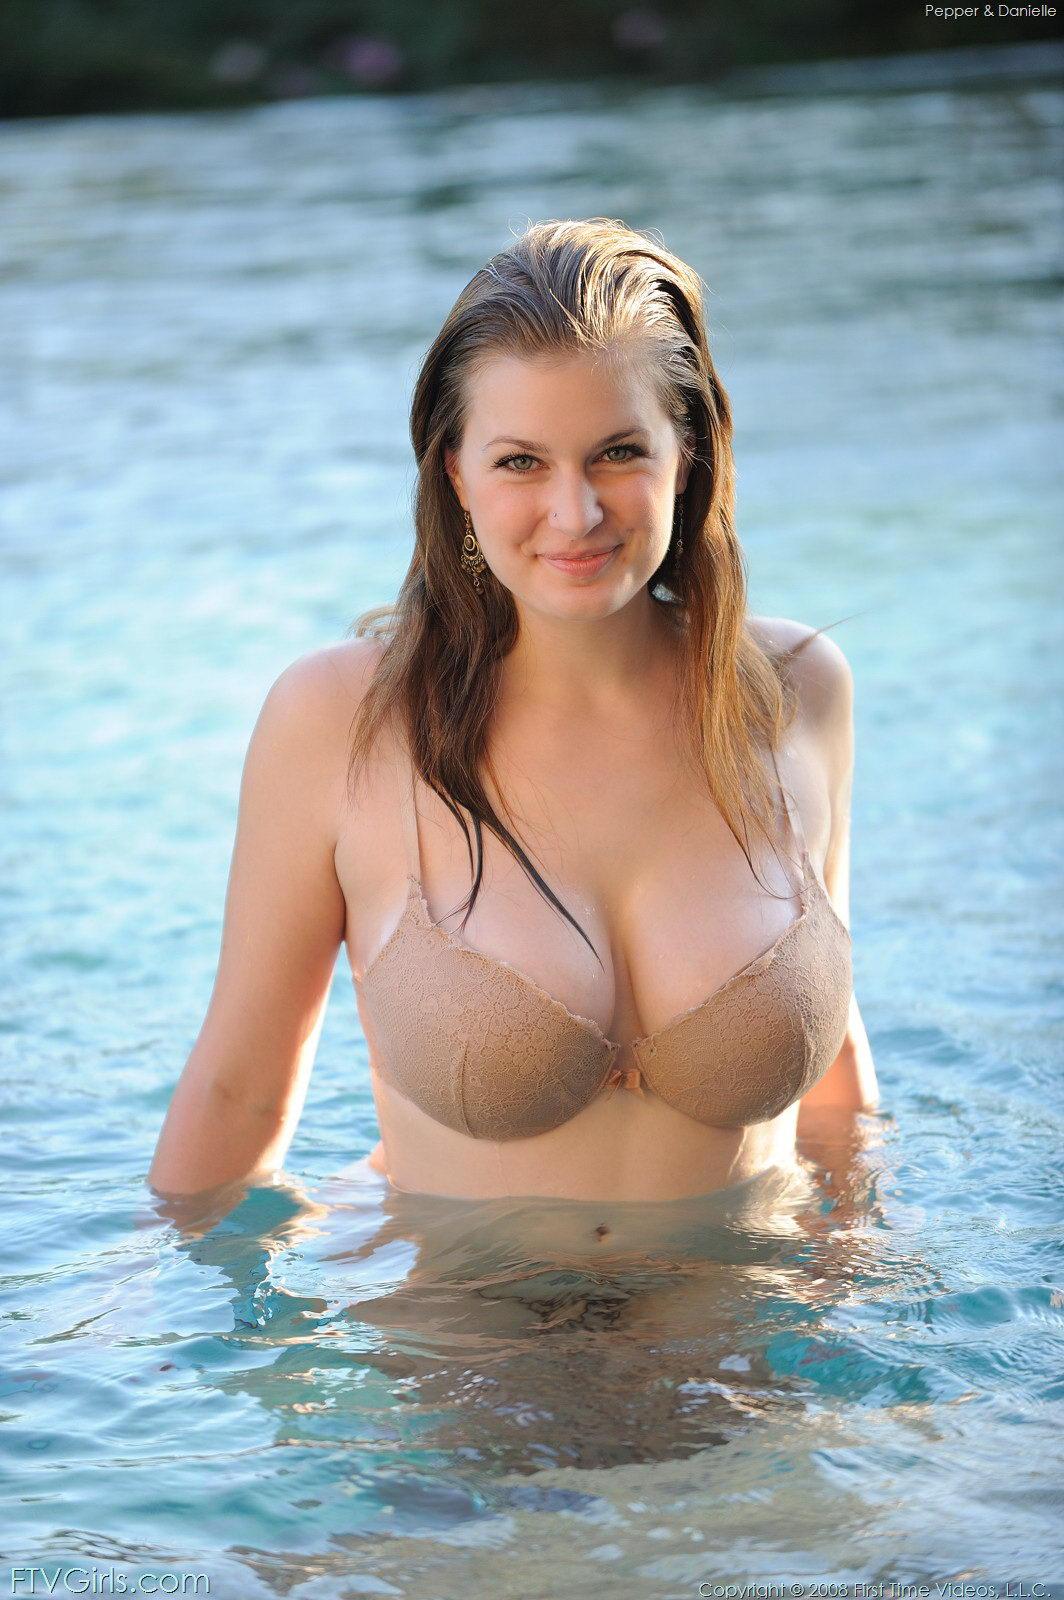 http://3.bp.blogspot.com/_7FfPYRI8DqI/TLcCHMmYbsI/AAAAAAAADFA/Po2y4Fn1rtE/s1600/Danielle+Ftv+Model+Pool+Fun+Gallery+%285%29.jpg